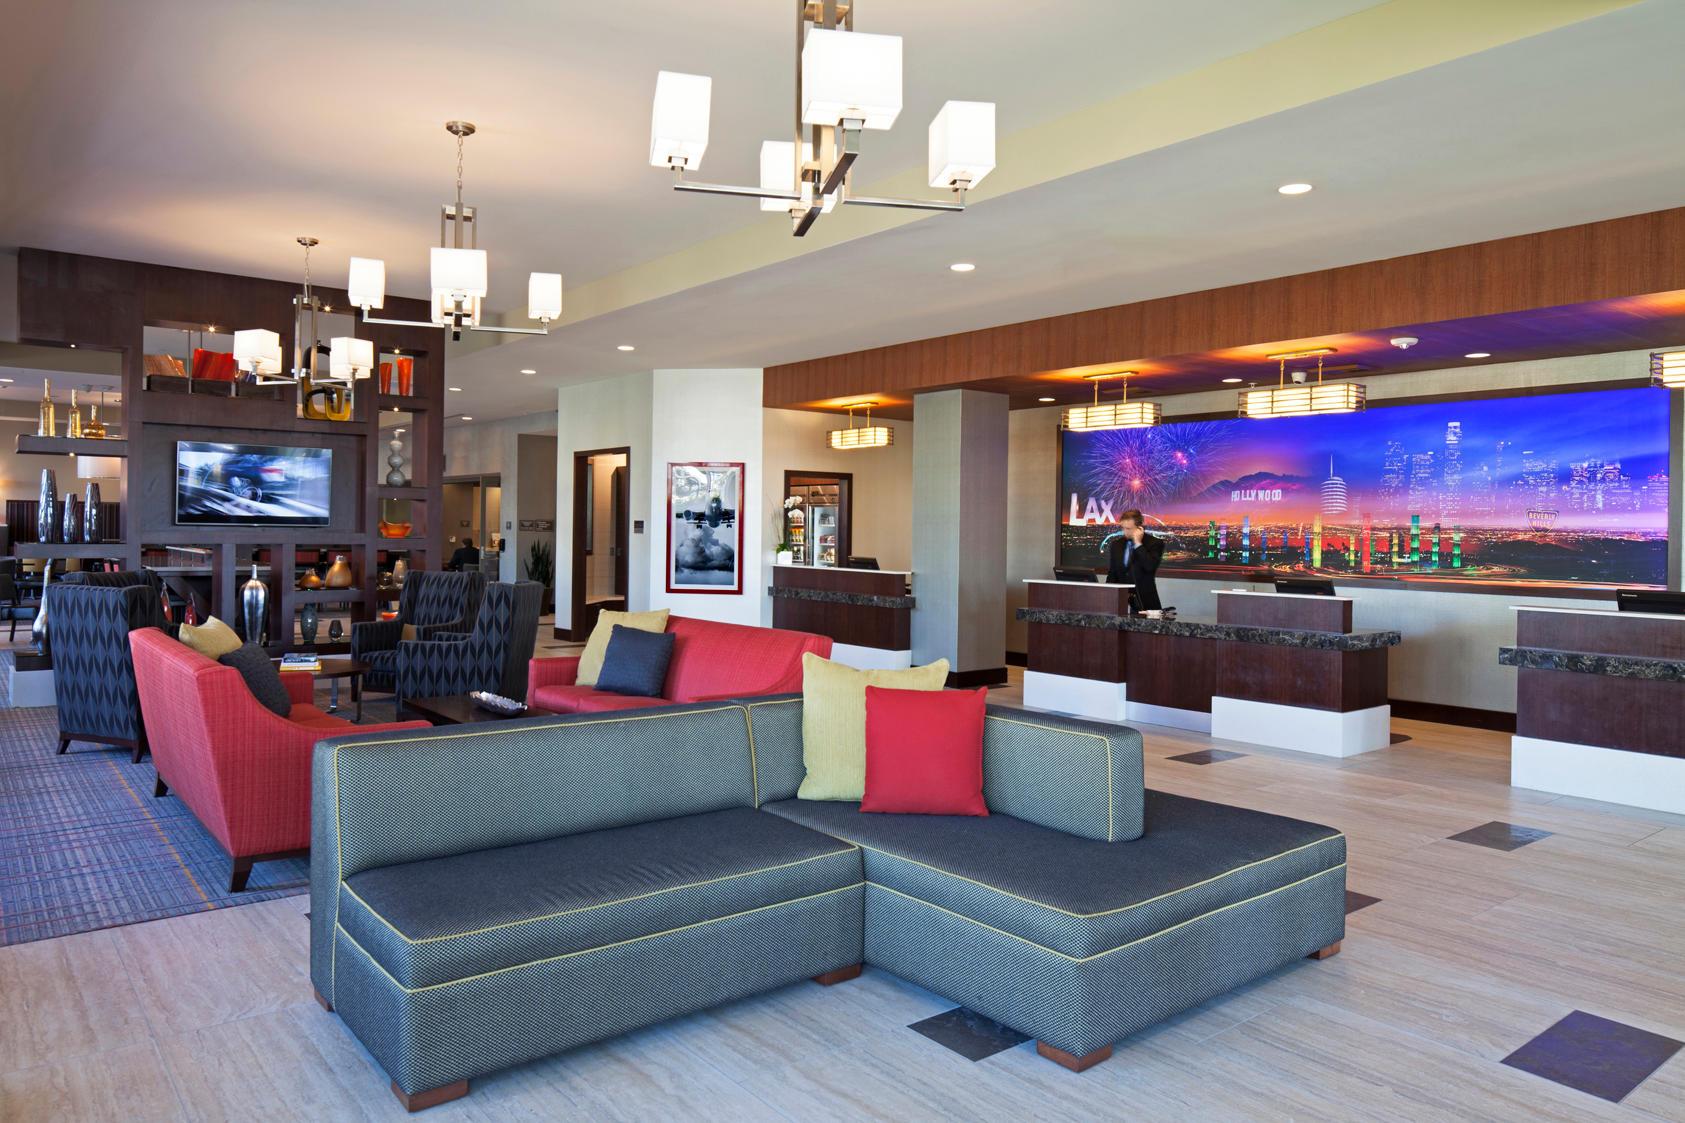 Residence Inn by Marriott Los Angeles LAX/Century Boulevard image 19